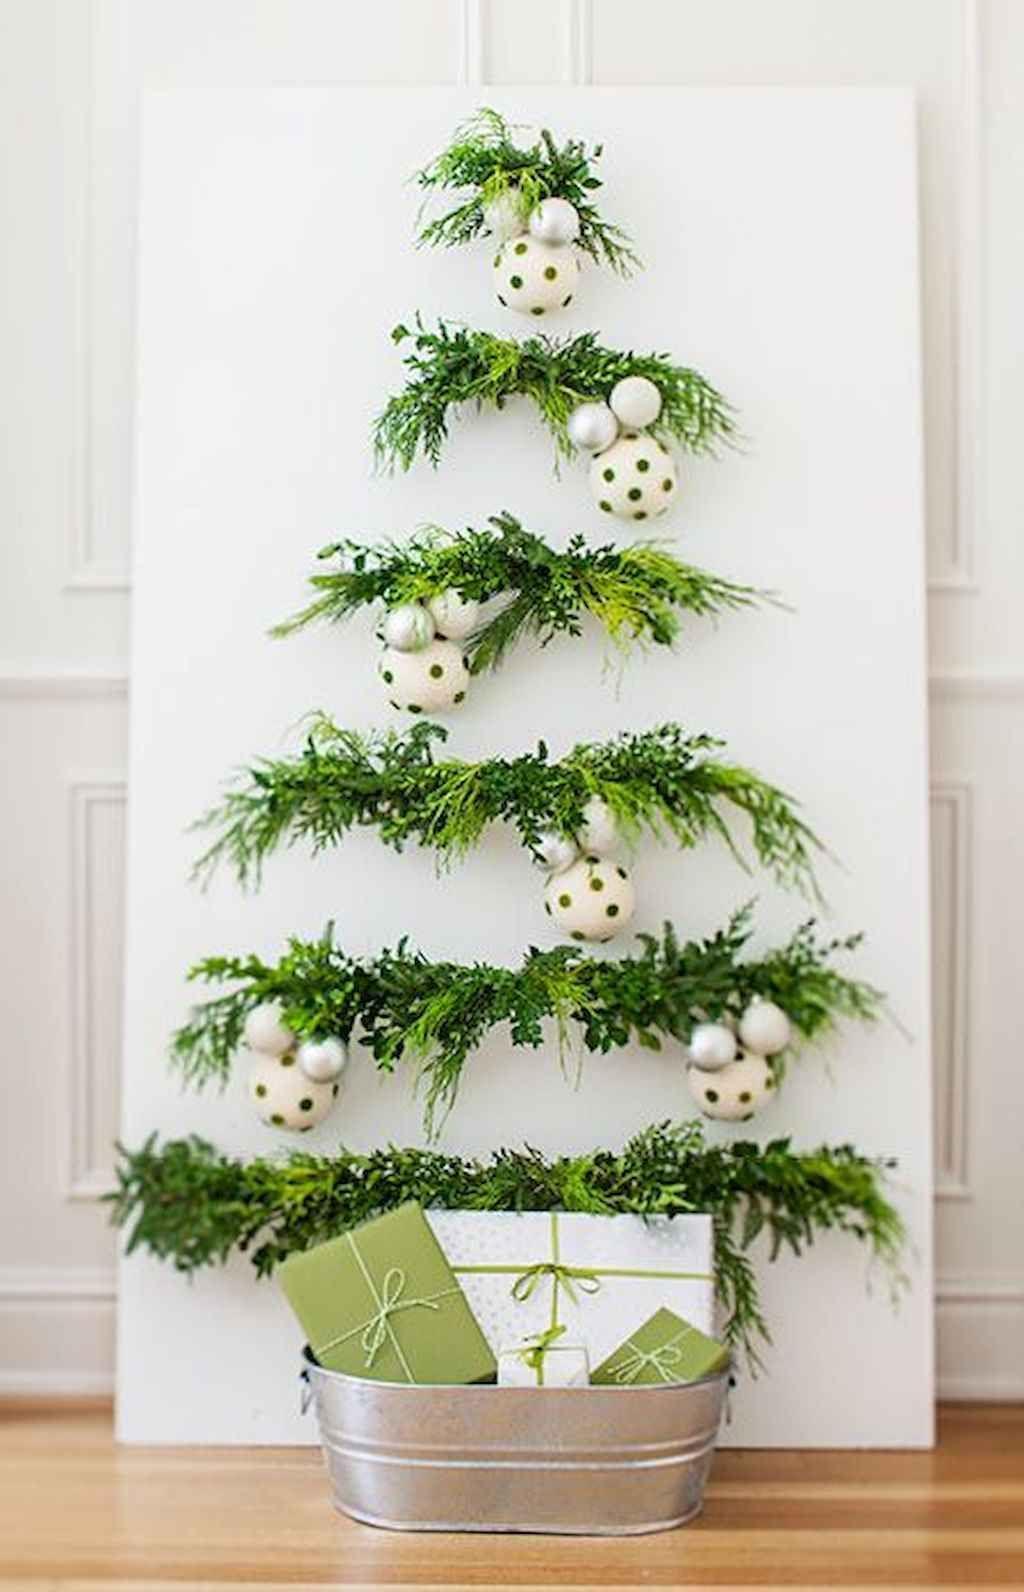 66 DIY Christmas Tree Decorating Ideas #christmastreeideas